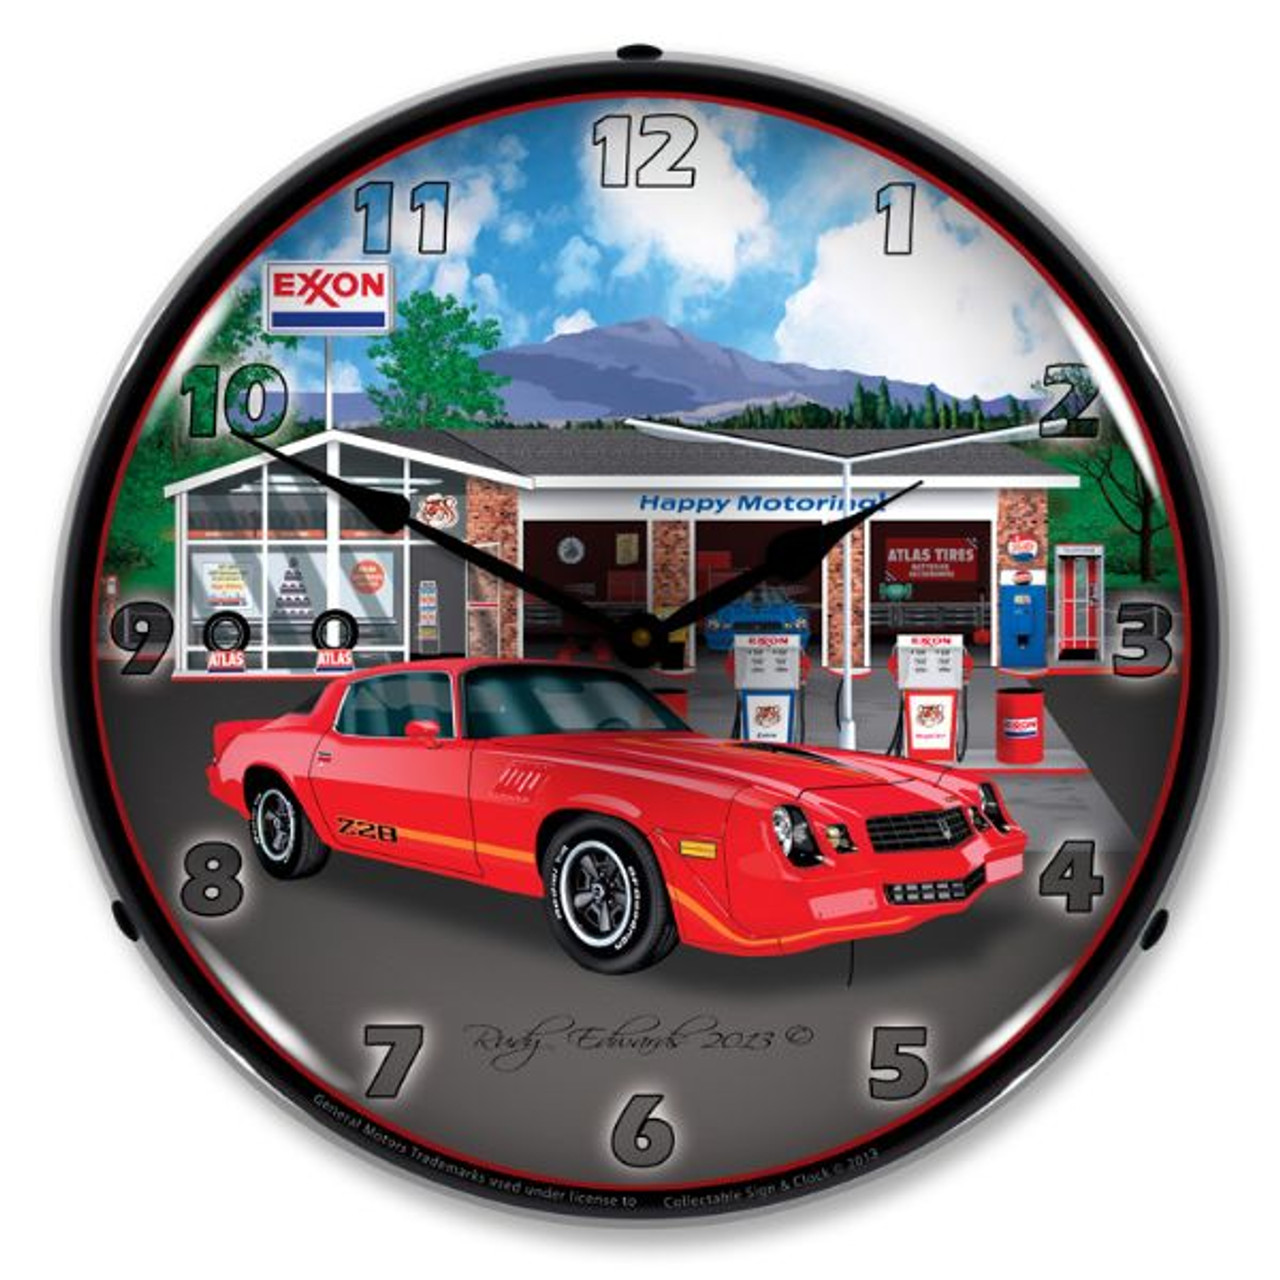 1979 Z28 Camaro Exxon Lighted Wall Clock 14 x 14 Inches